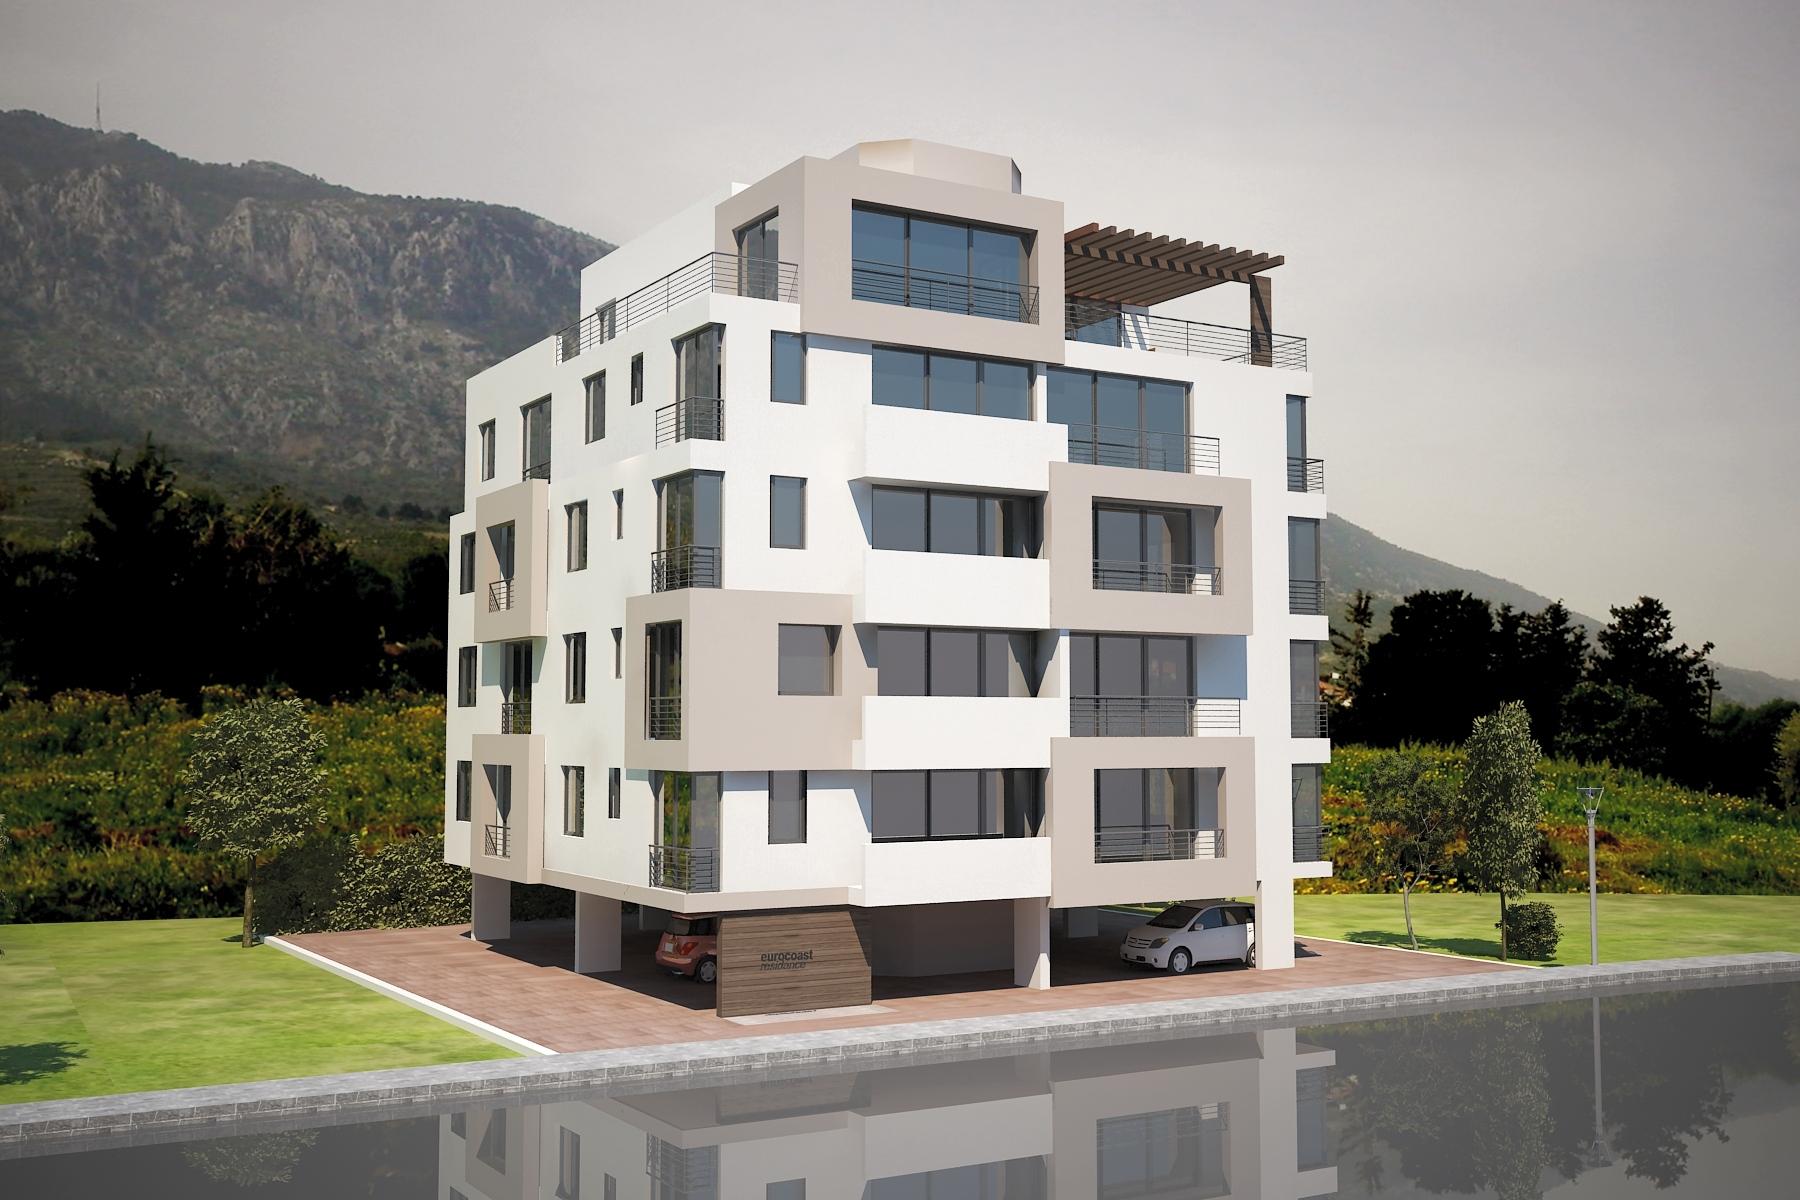 Eurocoast apartments